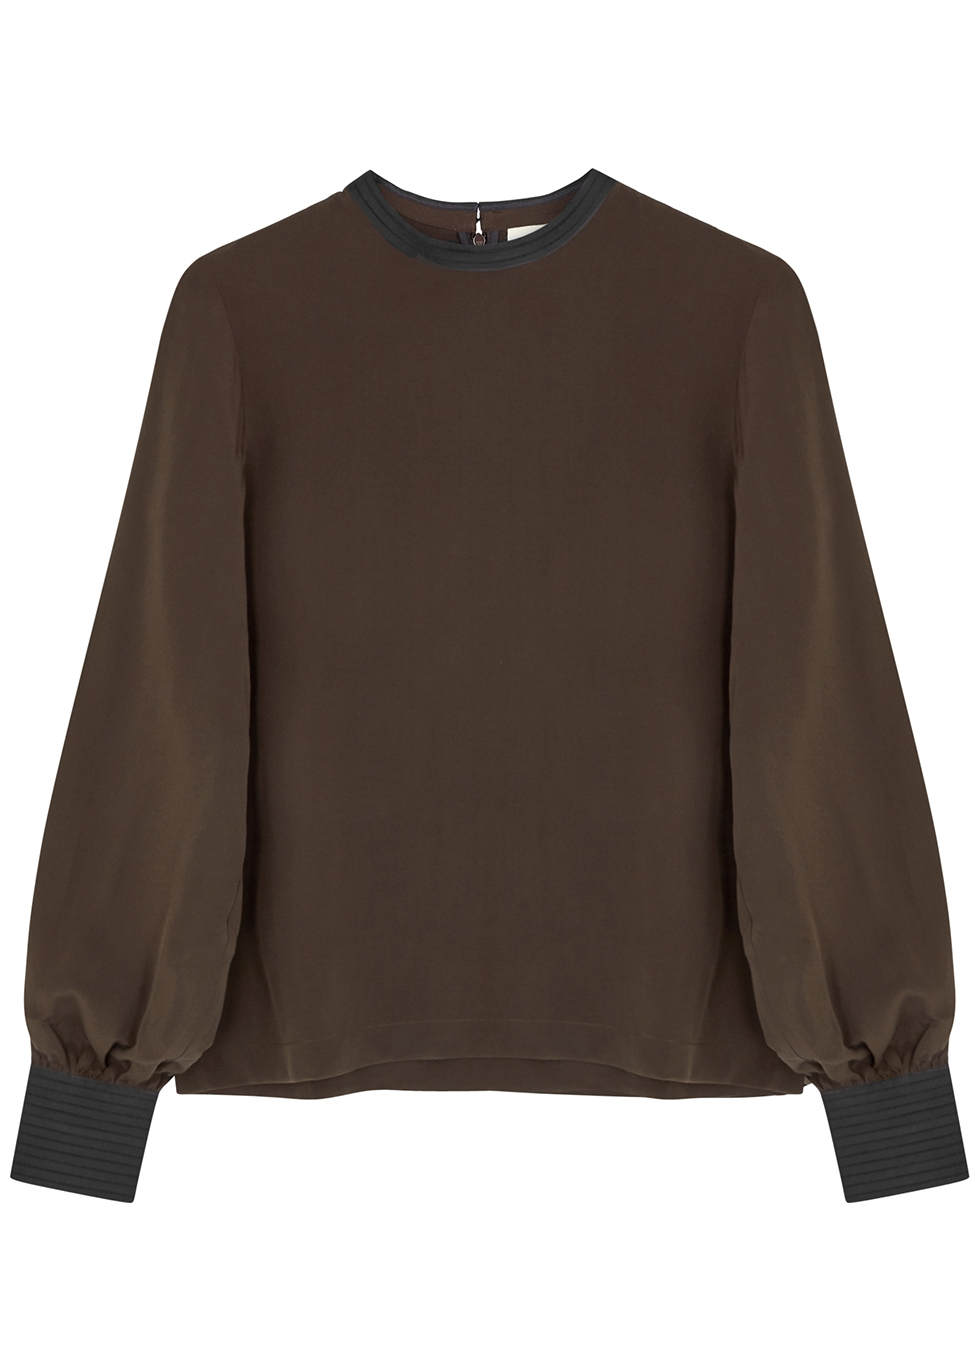 Brown silk blouse